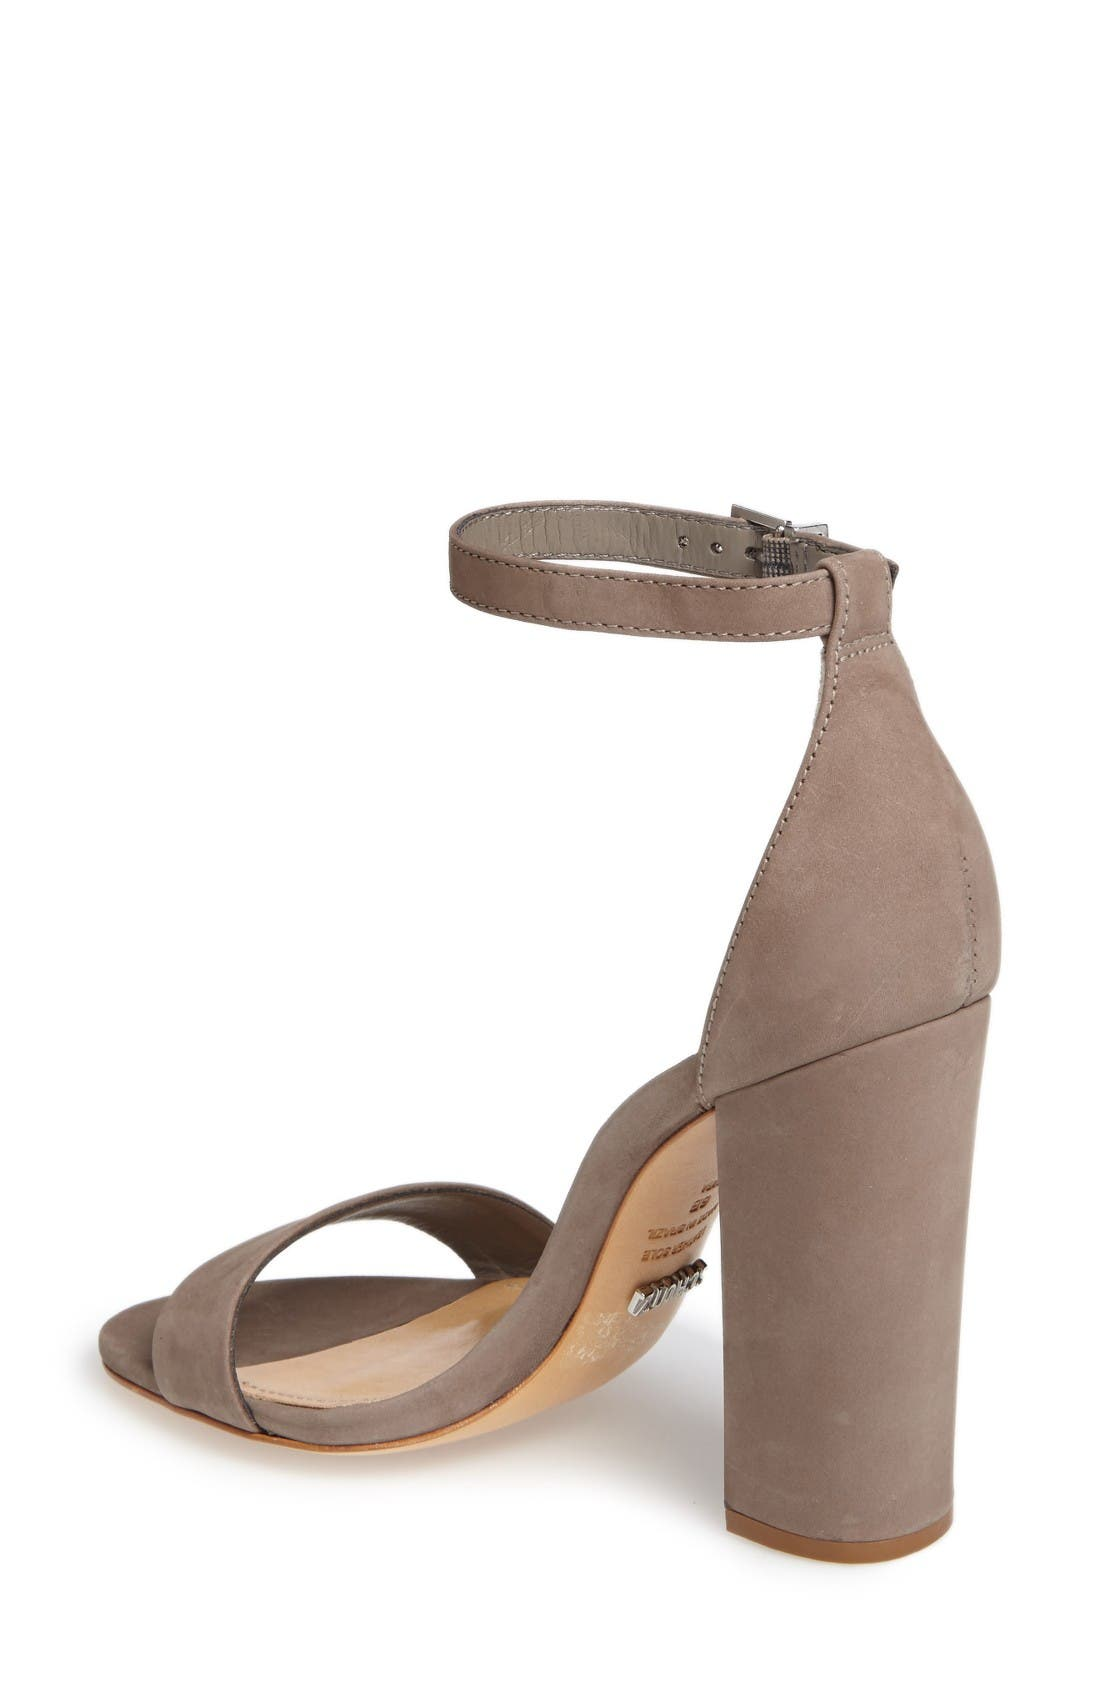 Enida Sandal,                             Alternate thumbnail 2, color,                             Mouse Nubuck Leather